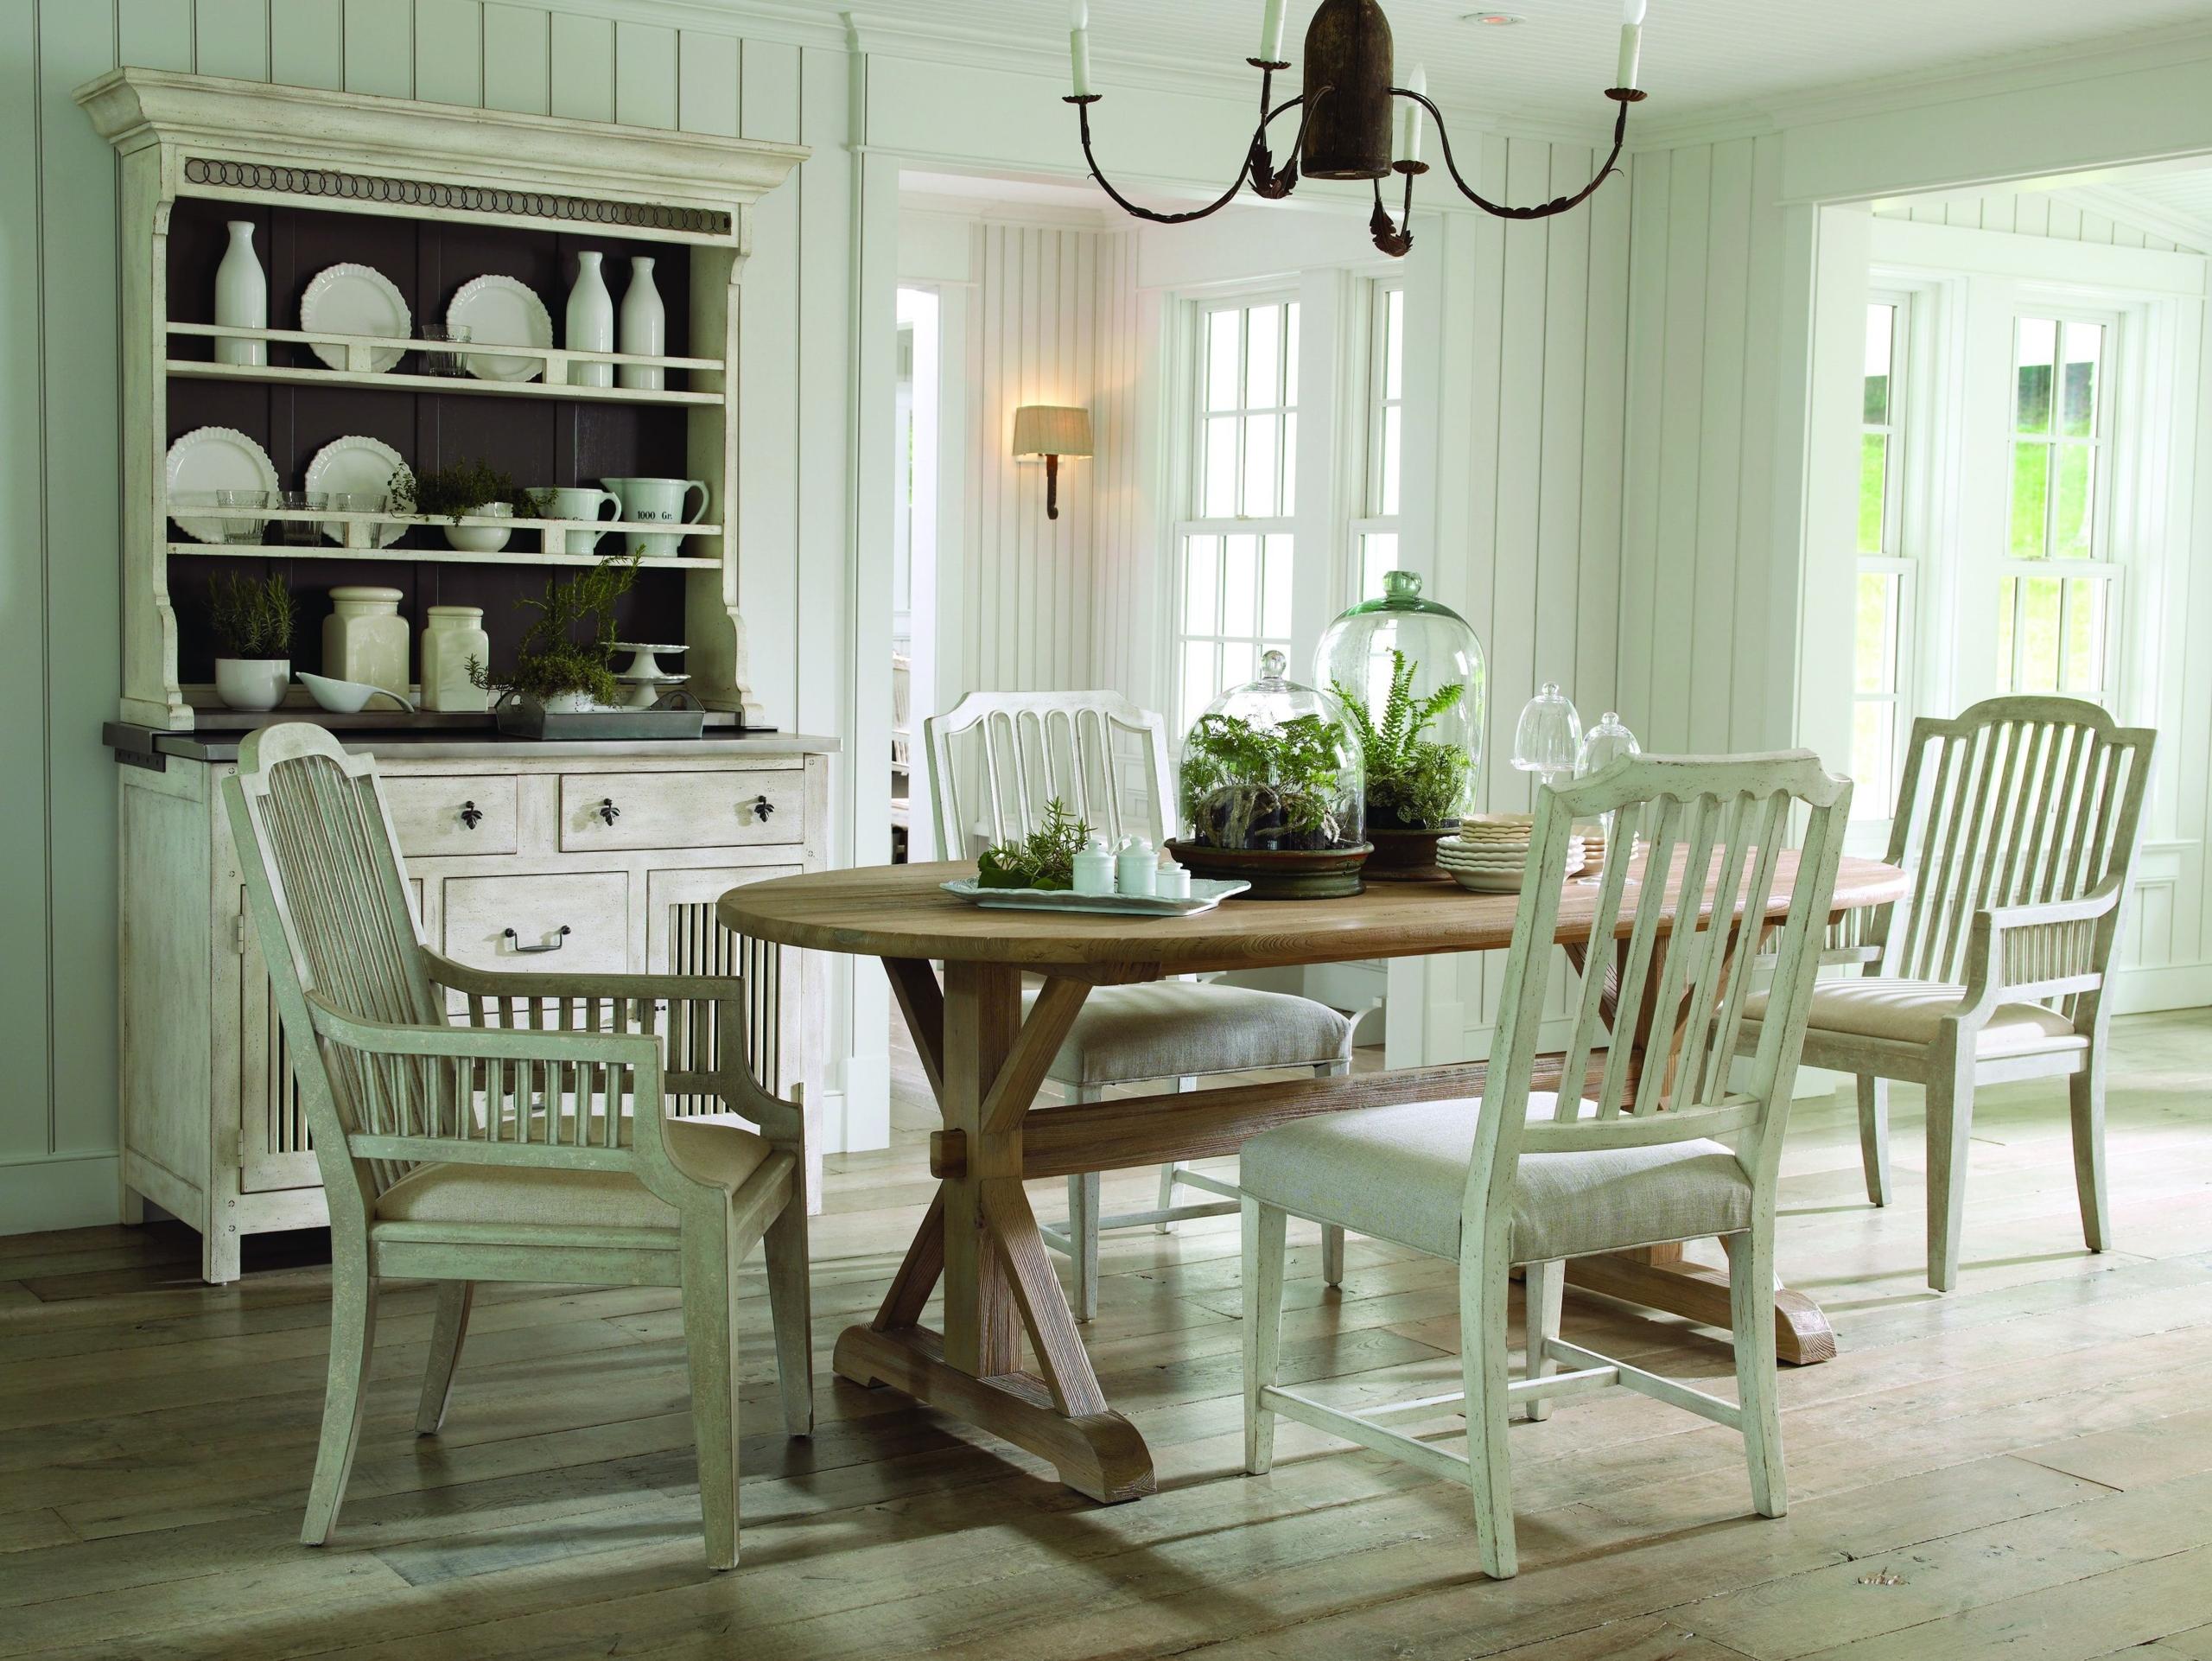 oval white dining table foter rh foter com Small Oval Dining Table white oval dining room tables